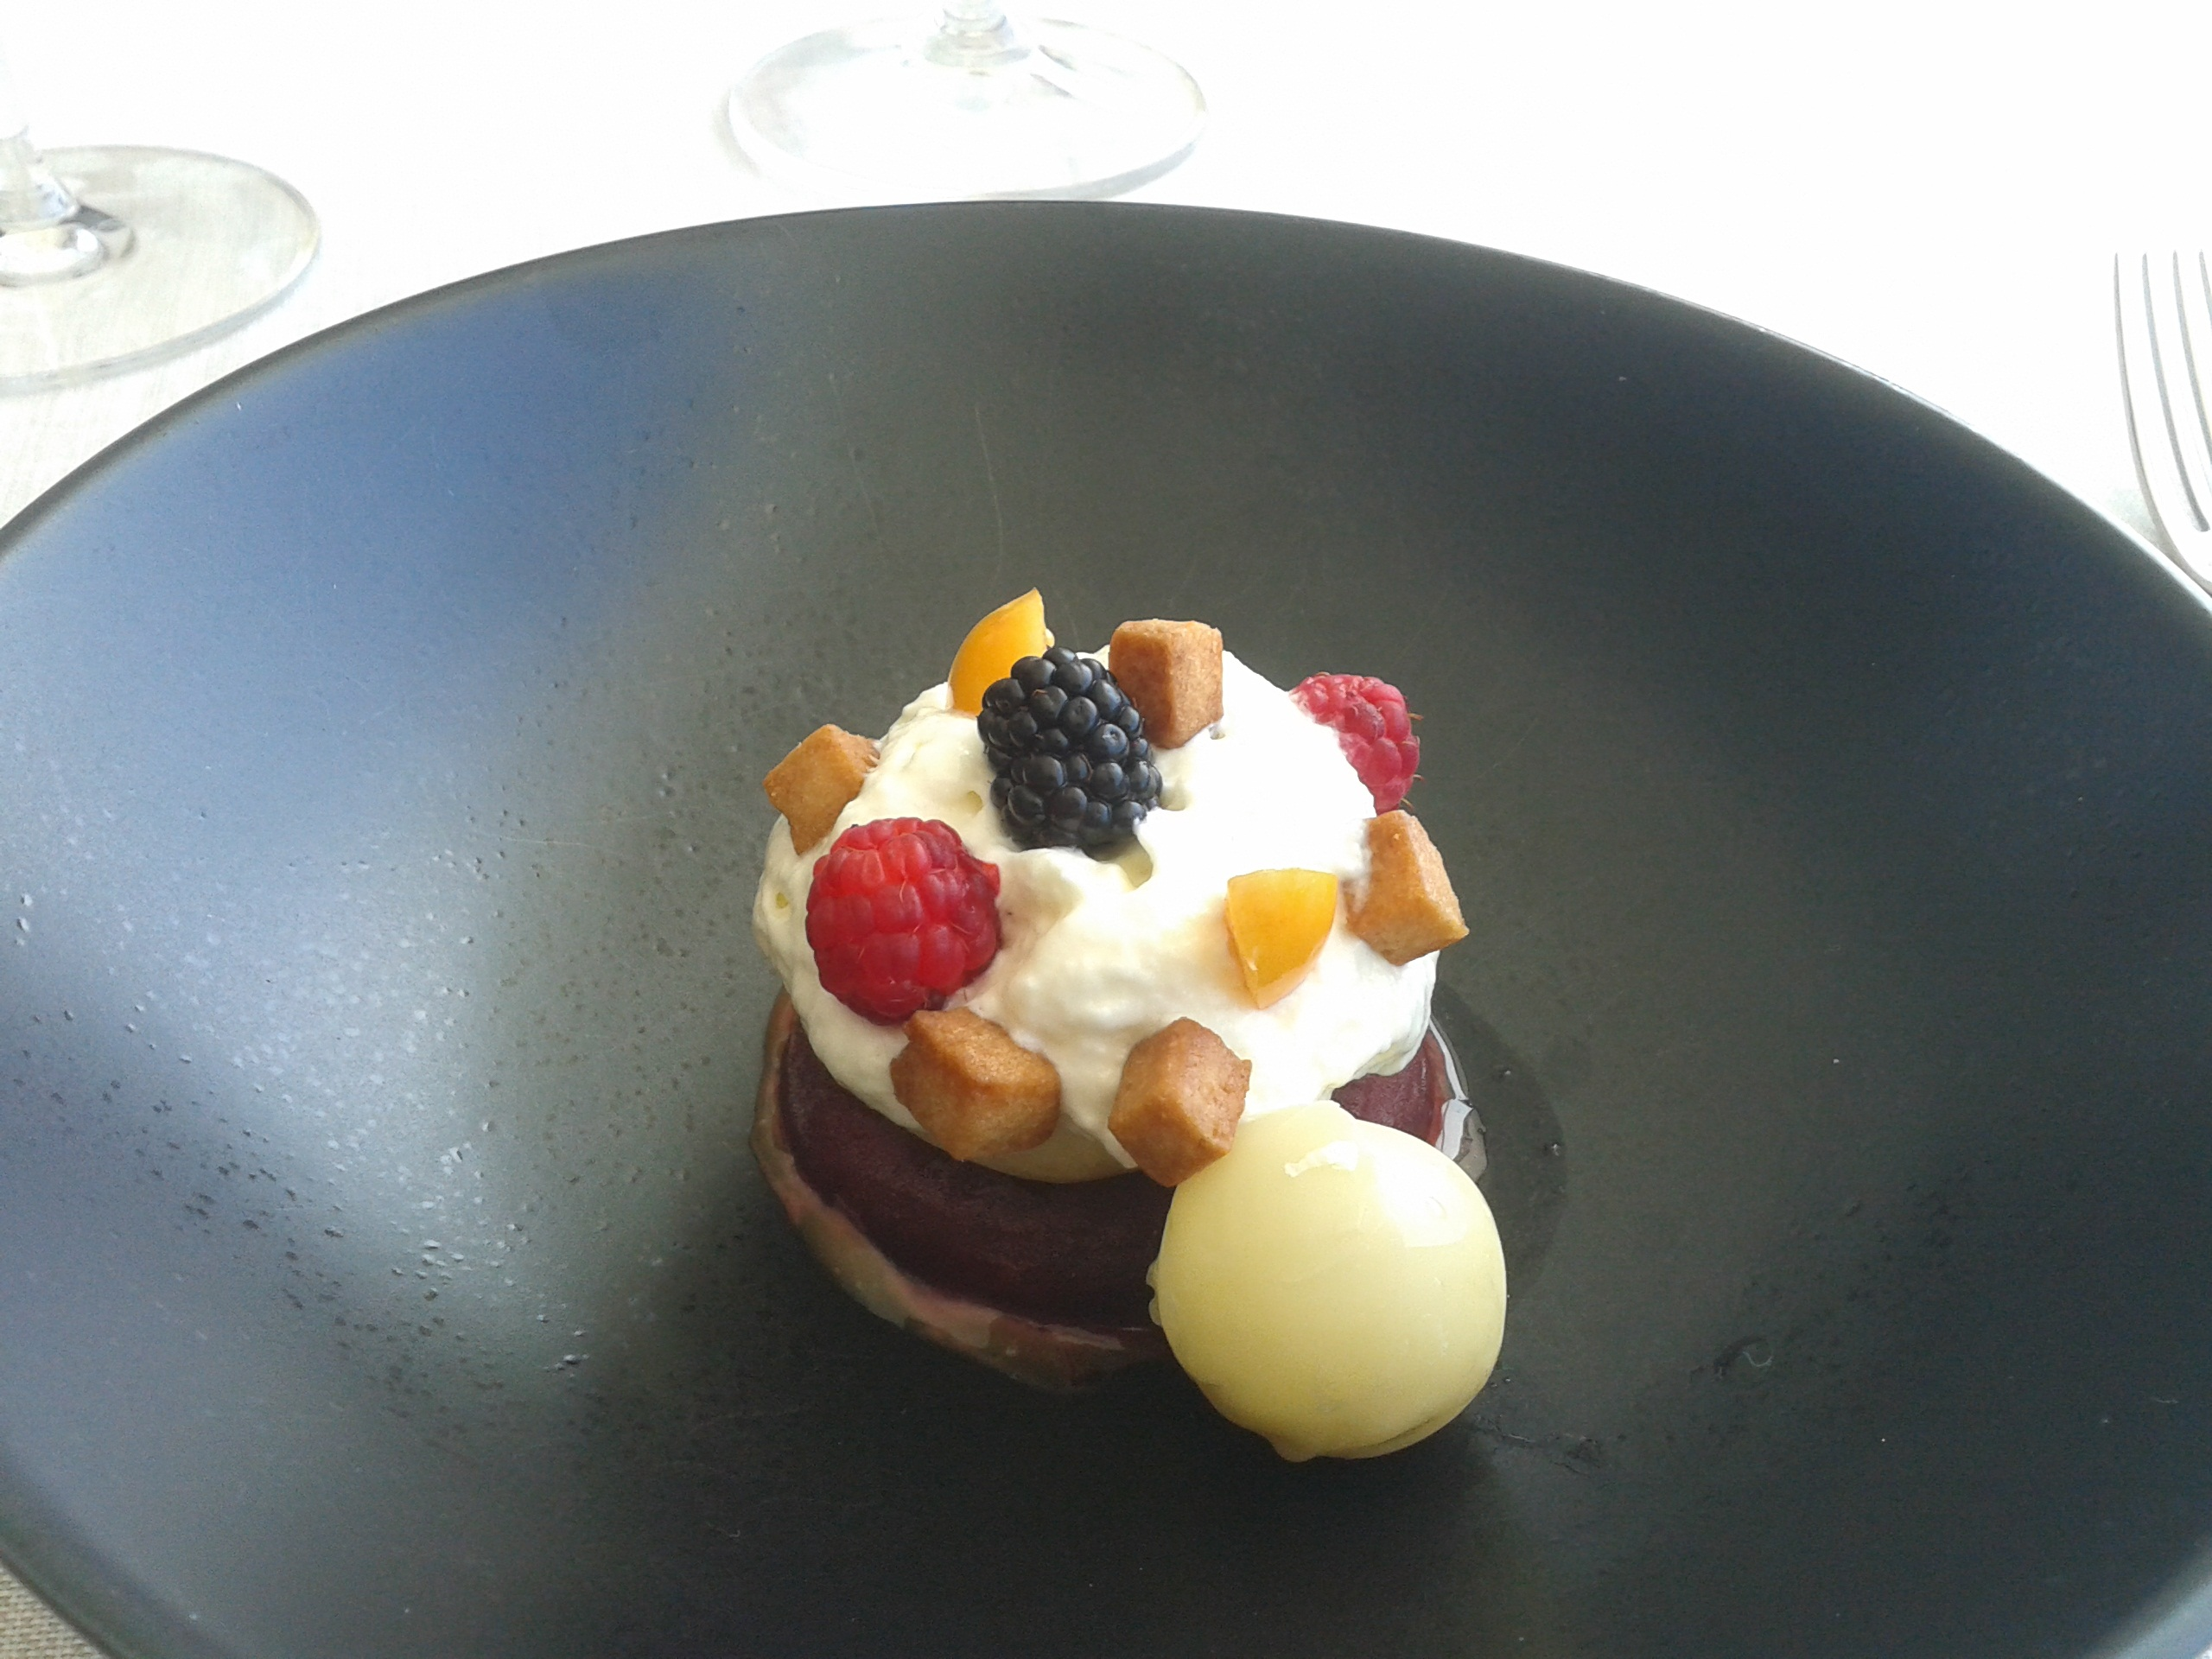 Culler de Pau en O Grove Frutos rojos con Cebreiro, ganache de chocolate blanco y fisalis